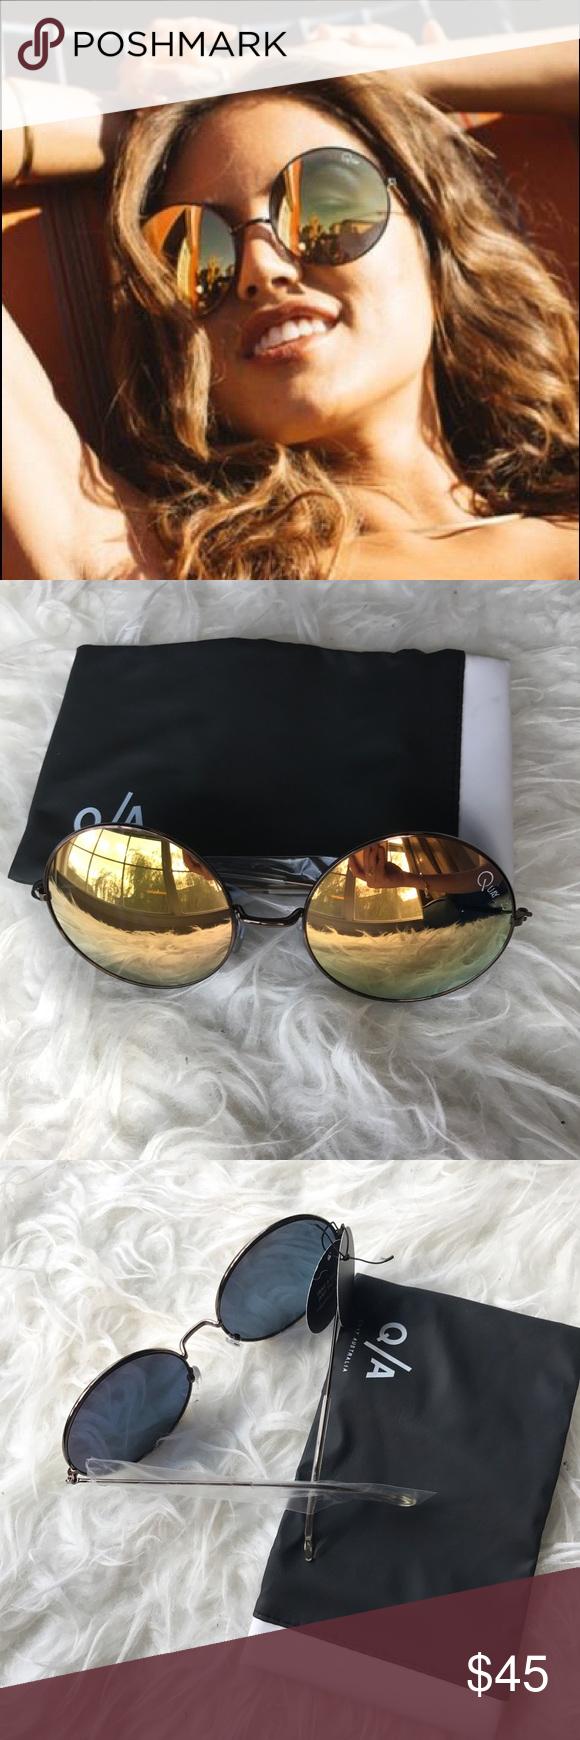 NWT Quay Australia Dynasty round mirror sunglasses Brand new with tag. Mirror lens Quay Australia Accessories Sunglasses